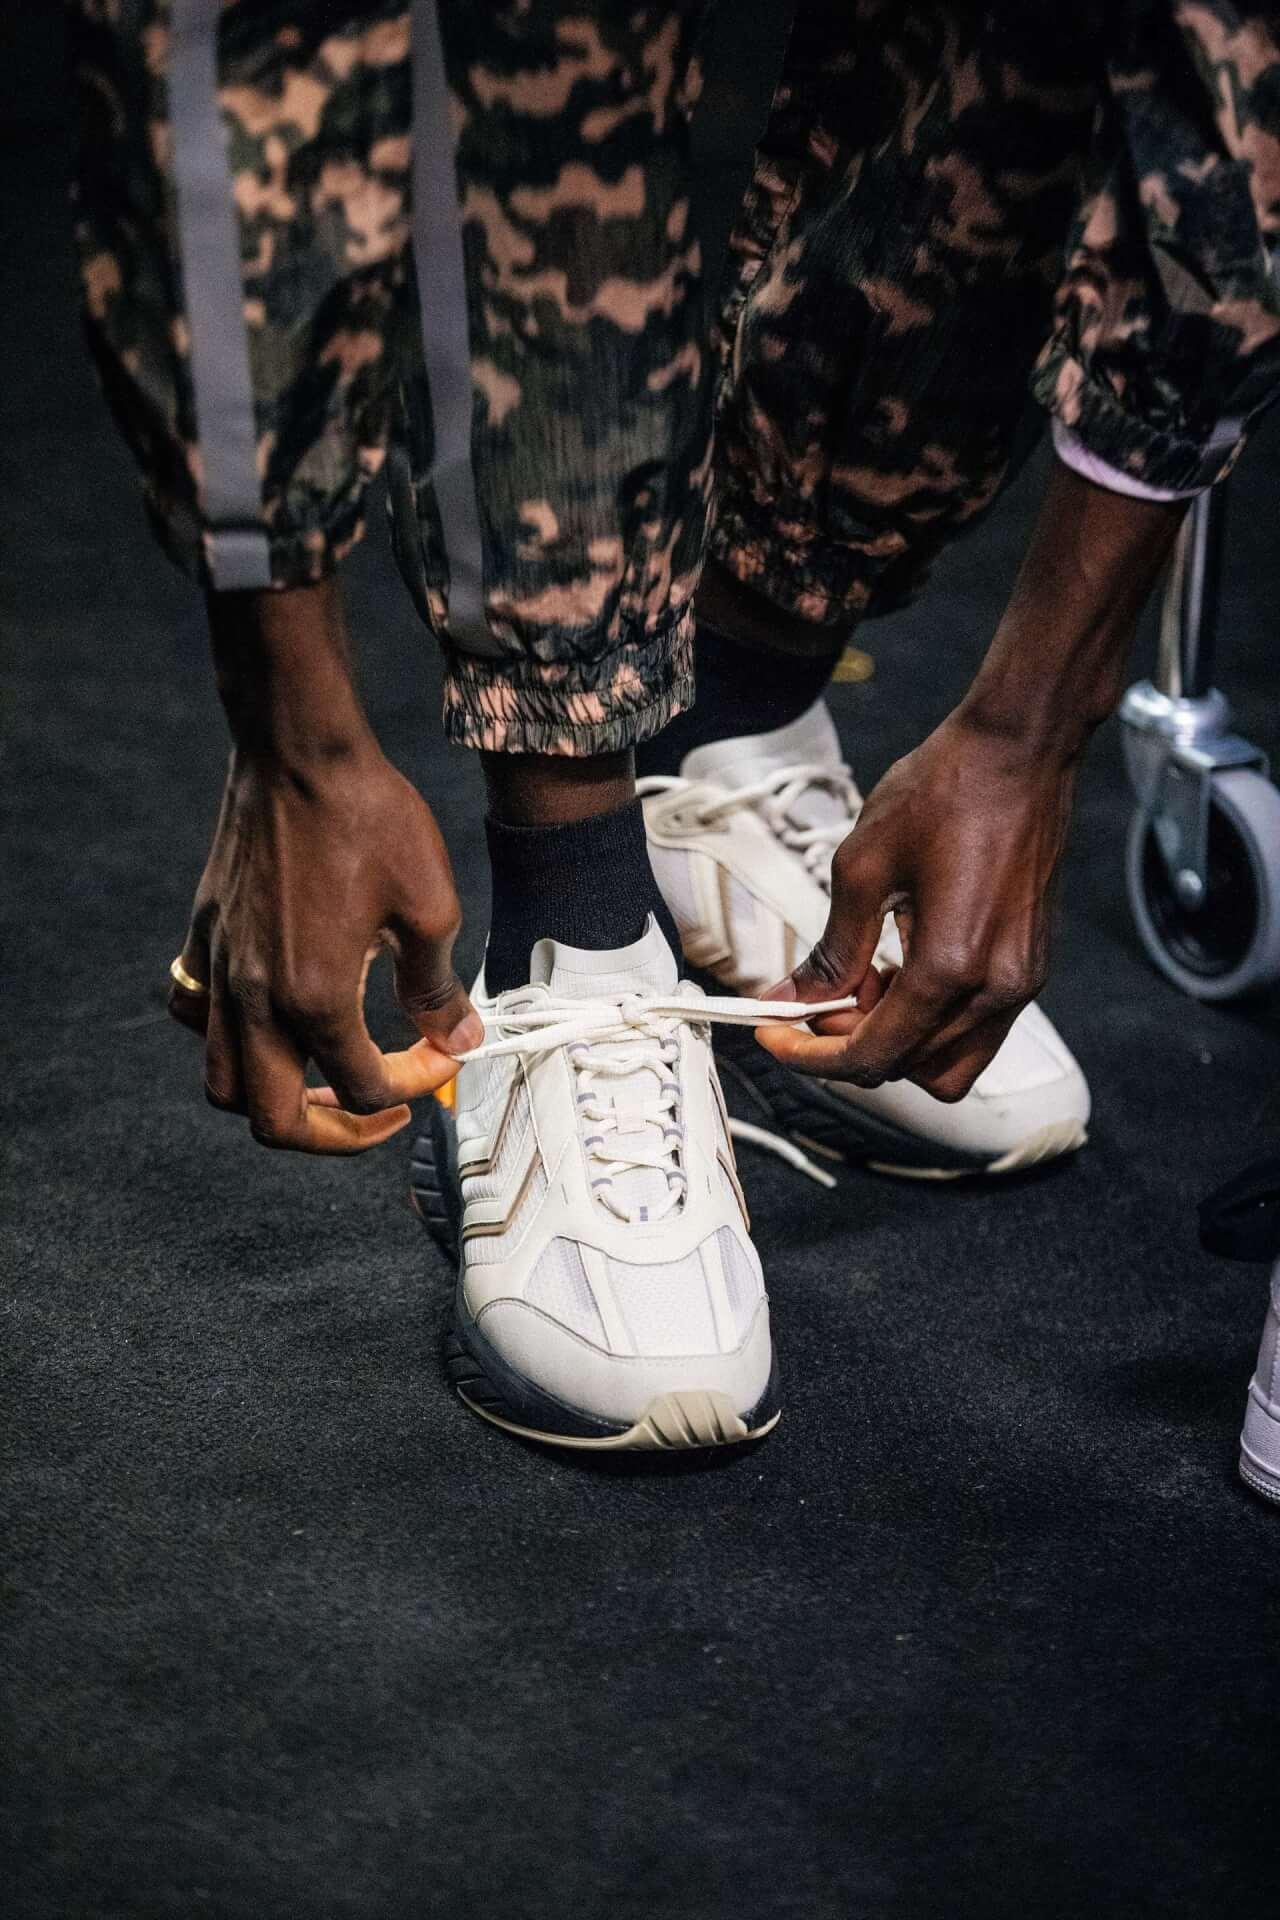 HUMMEL HIVEとASTRID ANDERSENのコラボスニーカーが東京・上野のmita sneakers限定で発売! lf200819_hummelhive_astritandersen_02